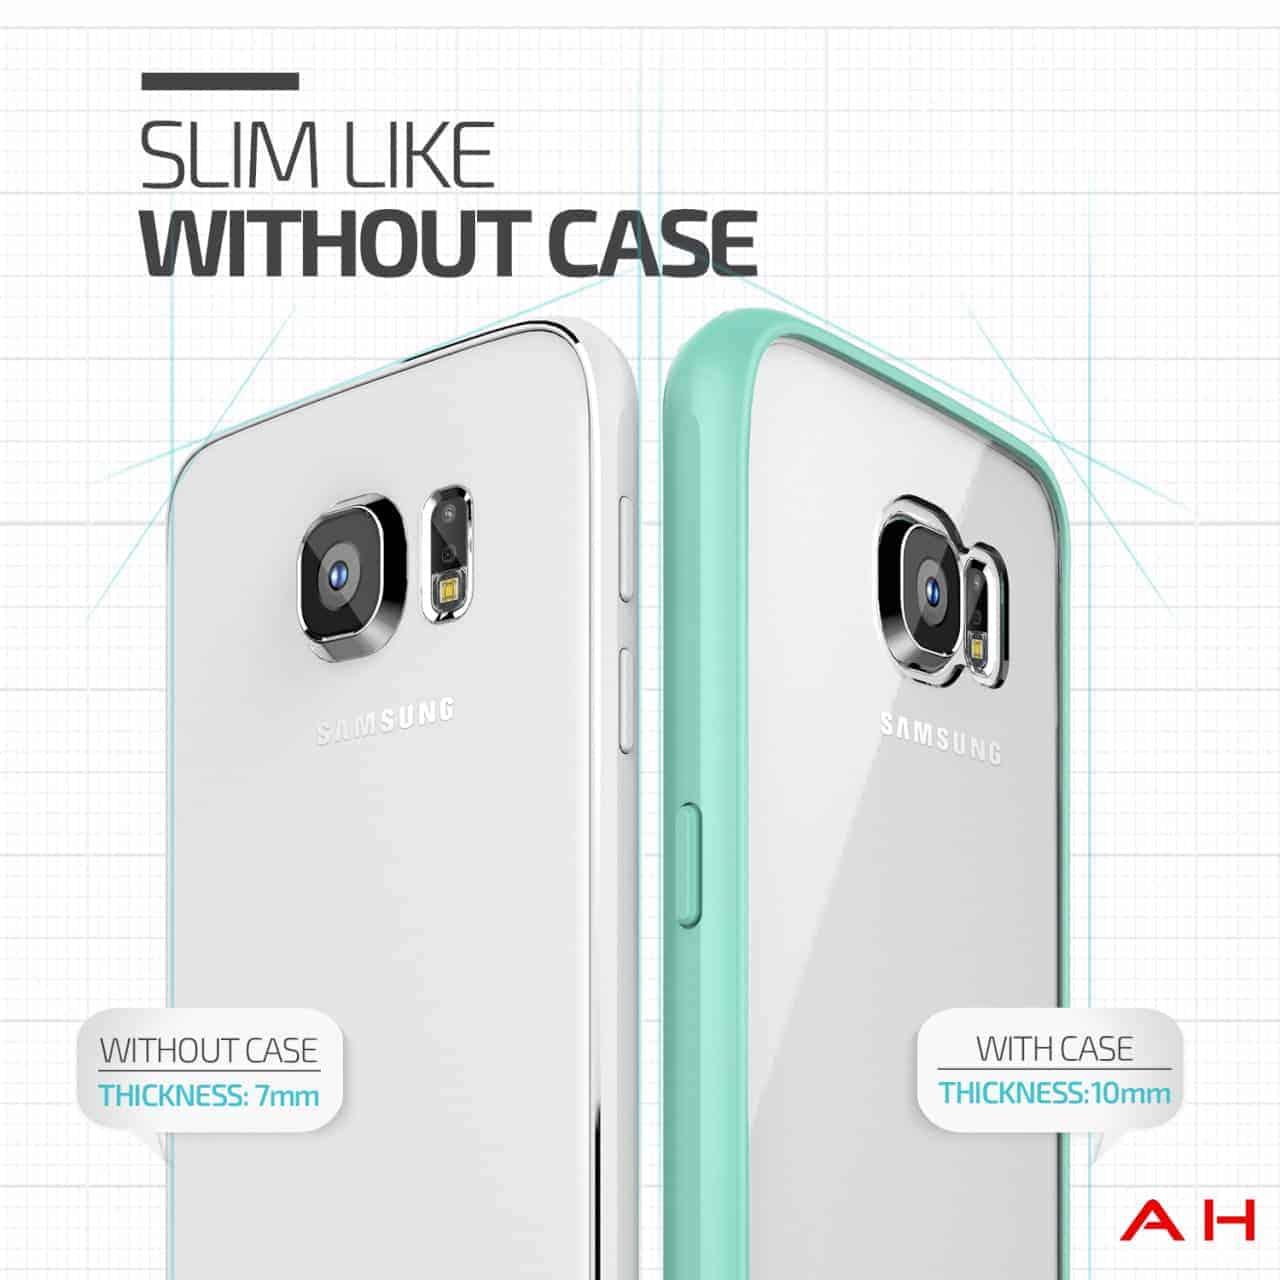 AH Samsung Galaxy S6 Verus Leaked Images-1